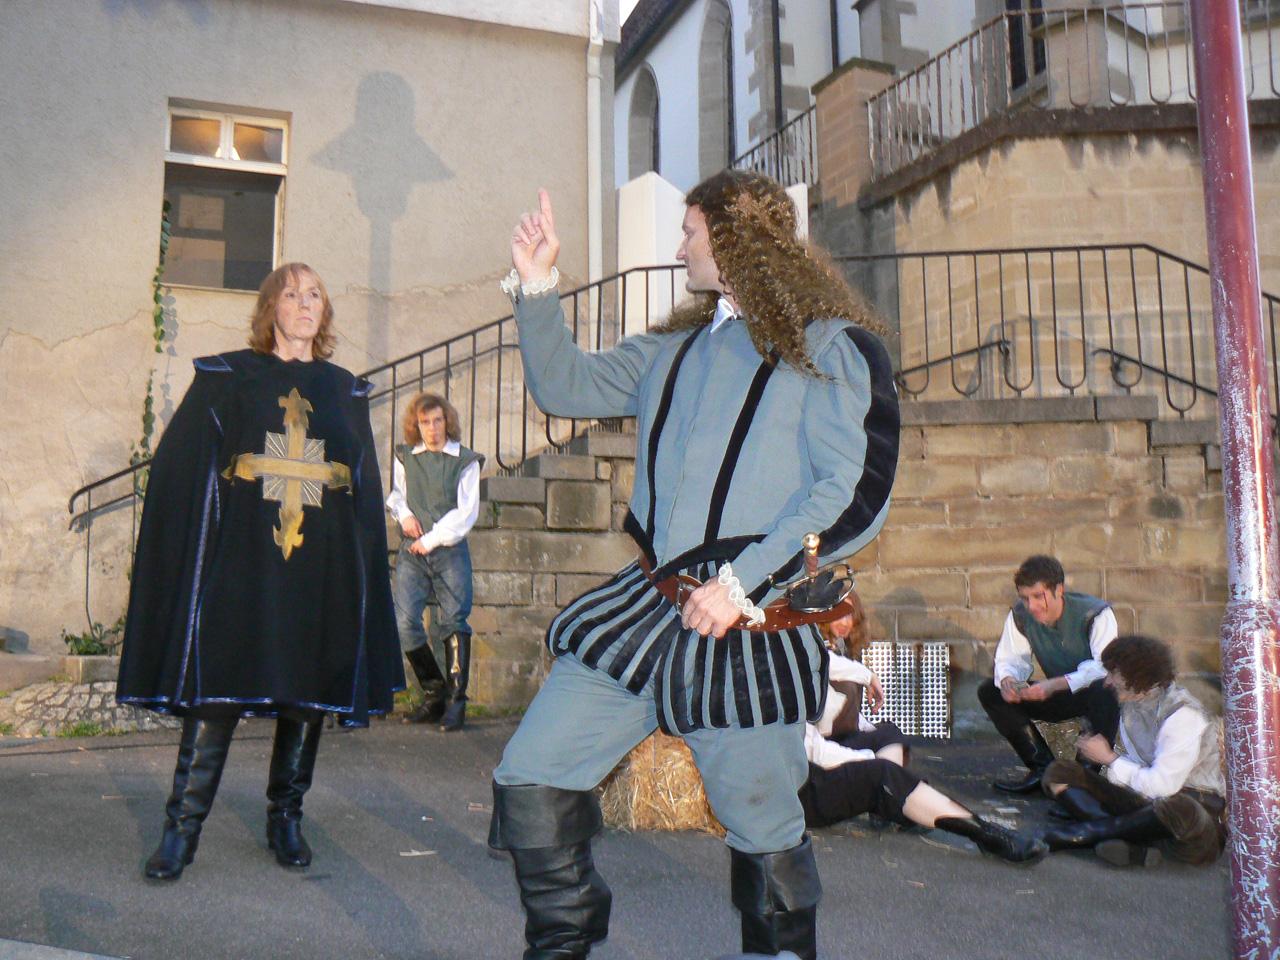 2007: Carbon de Castel-Jaloux, Montfleury in Cyrano von Bergerac